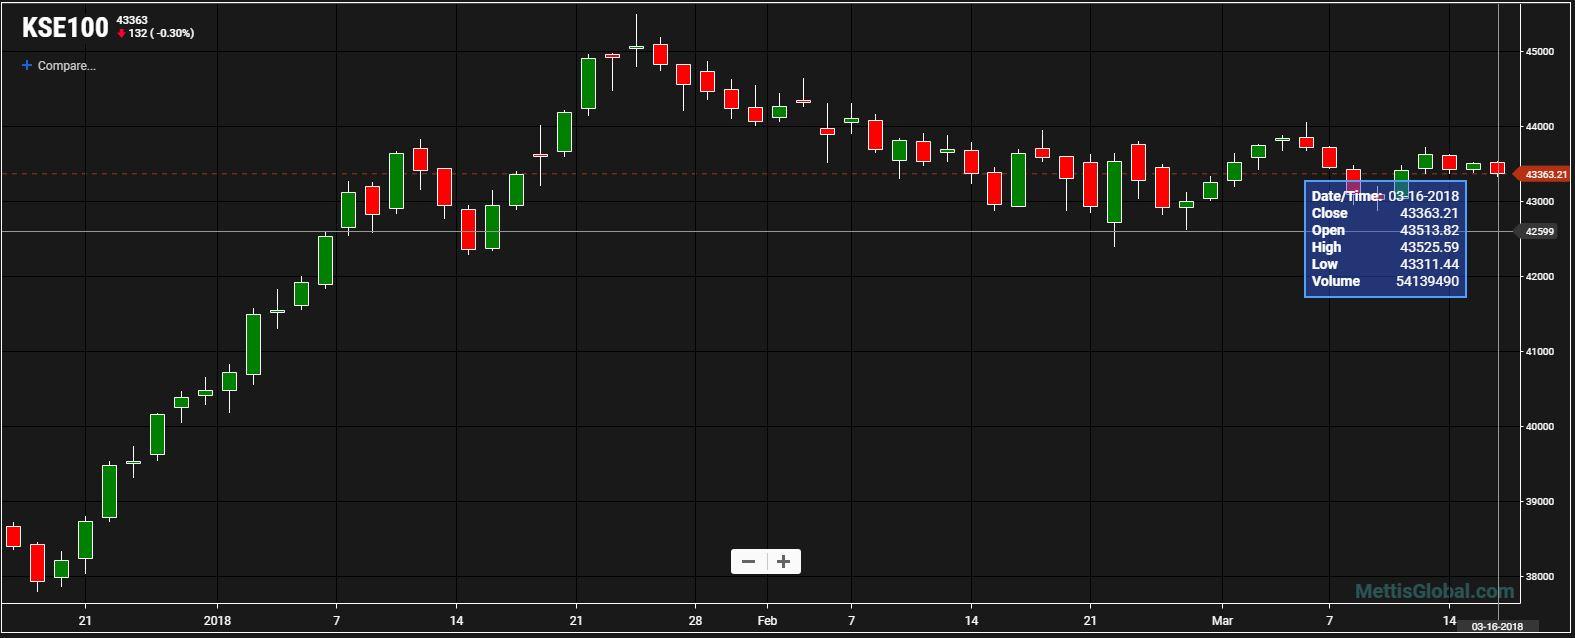 Kse 100 index down 131 points mettis global news buycottarizona